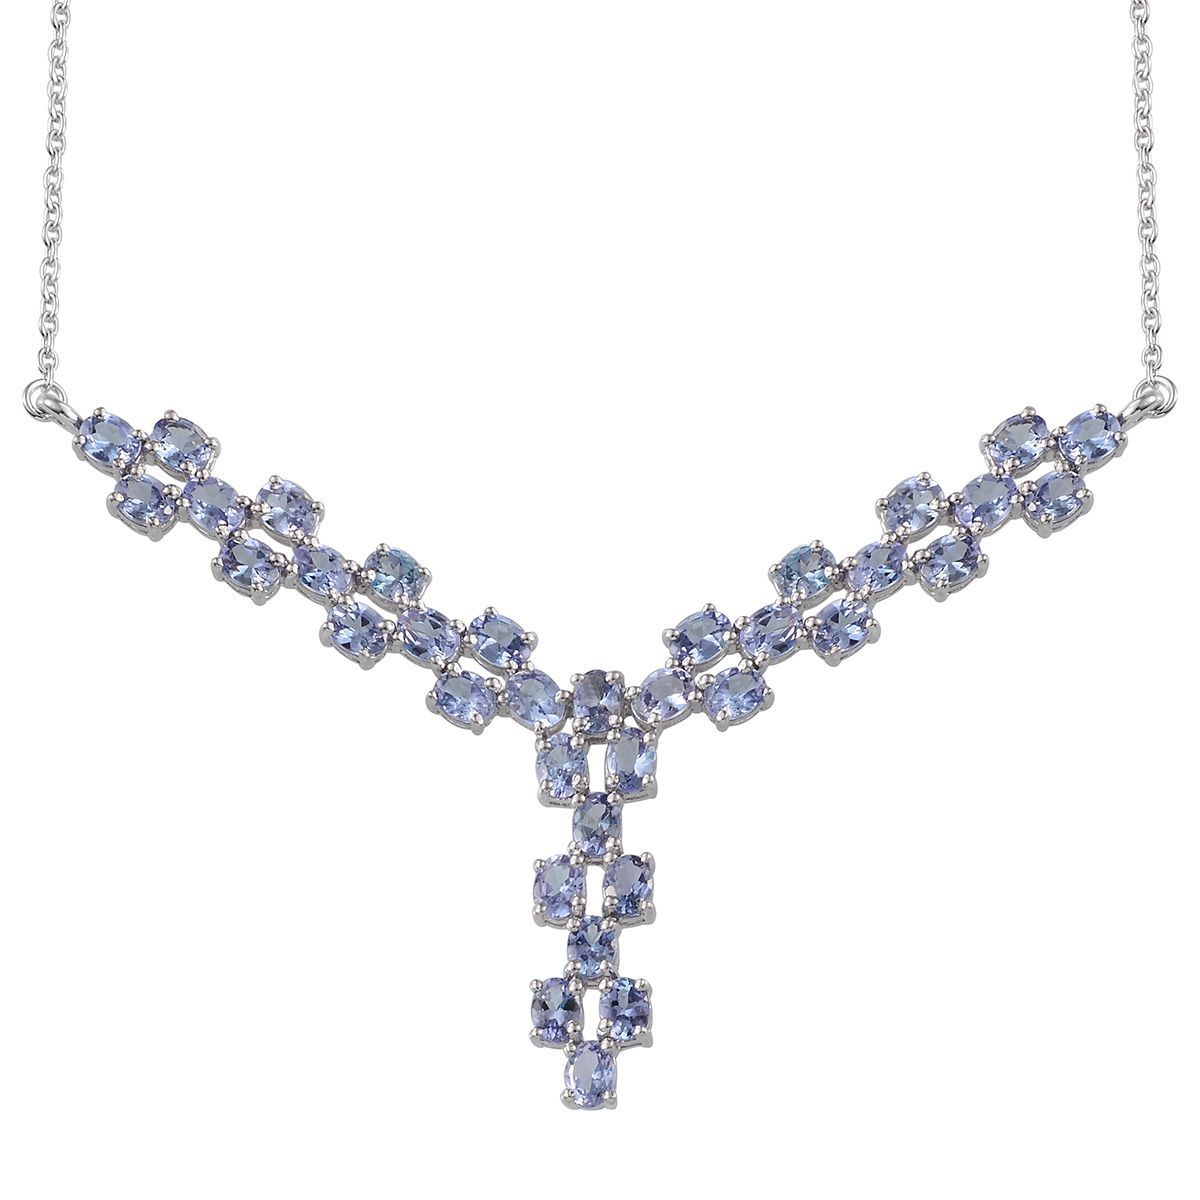 Bondi Blue Tanzanite (Ovl) Necklace (18 in) in Platinum Overlay Sterling Silver Nickel Free TGW 6.12 Cts.